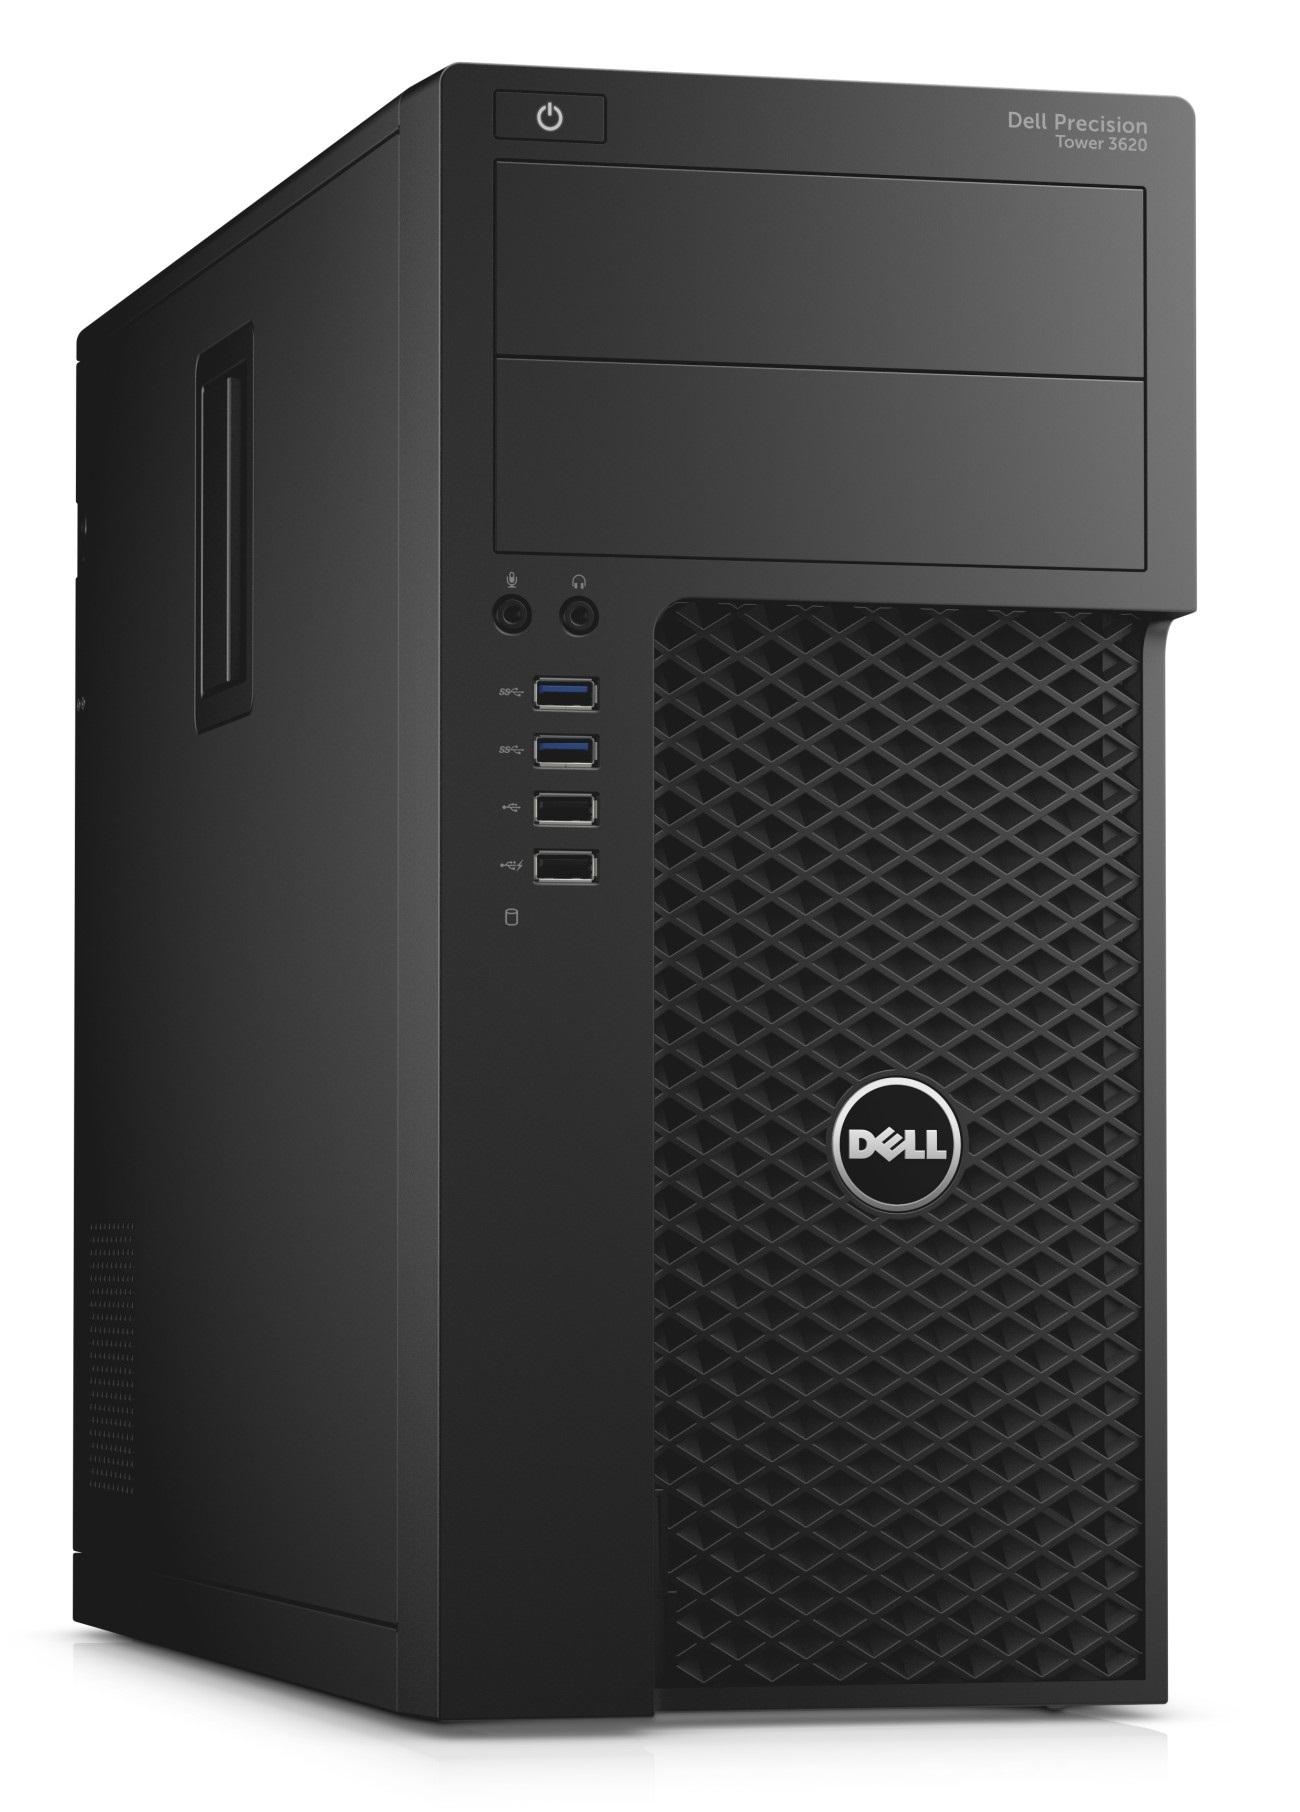 Dell Precision T3620 MT E3-1240/16G/1TB/M2000-4G/DP/W7P+W10P/3R NBD